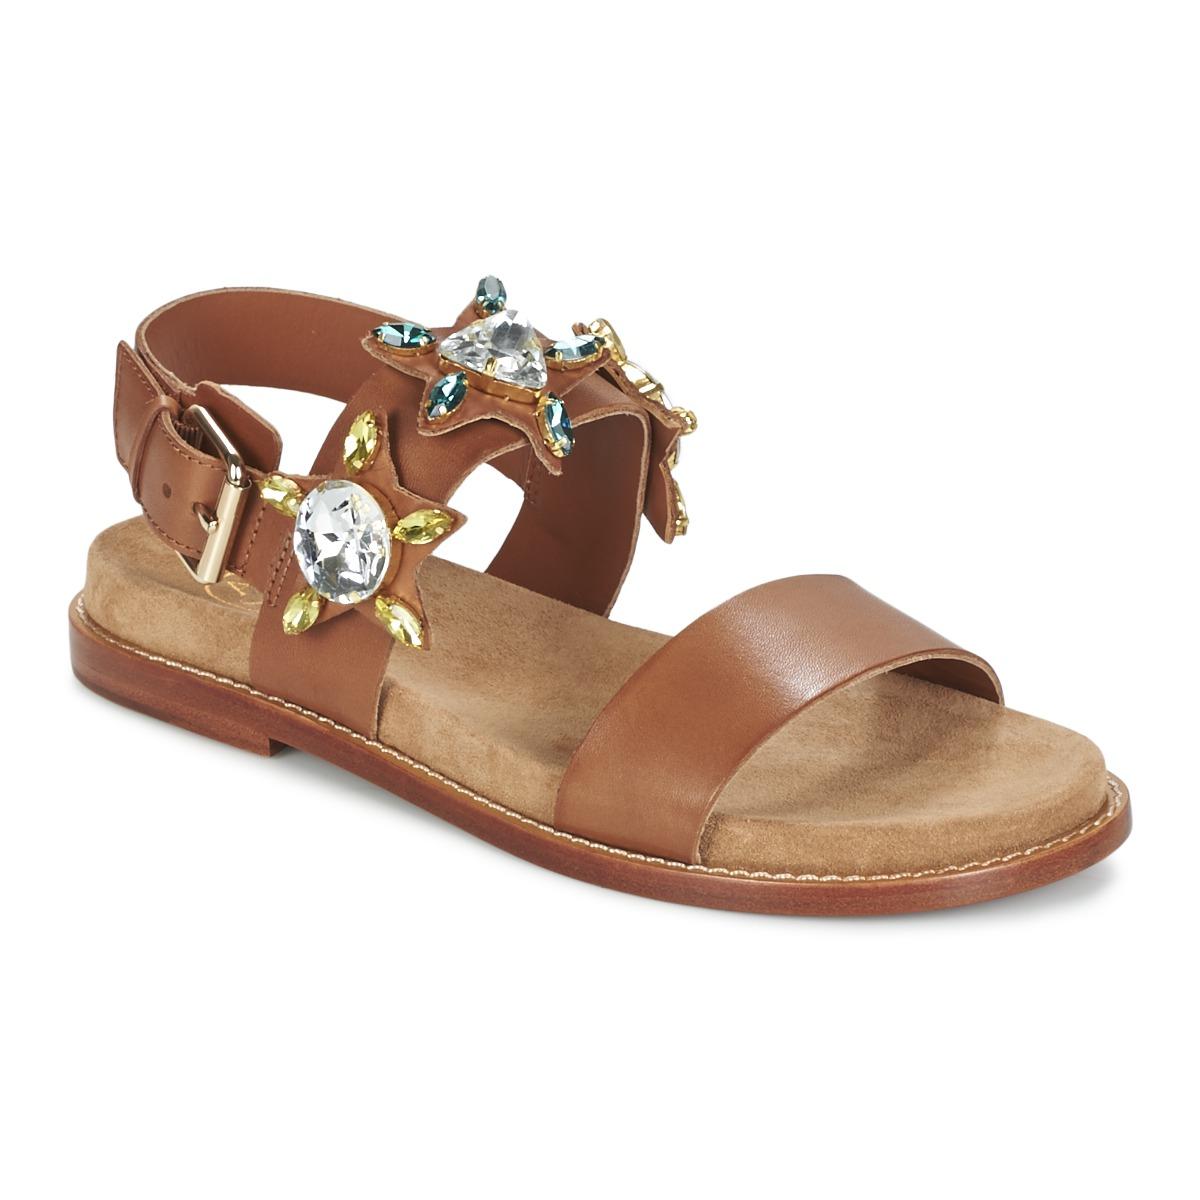 Ash MALIBU Camel - Kostenloser Versand bei Spartoode ! - Schuhe Sandalen / Sandaletten Damen 112,50 €